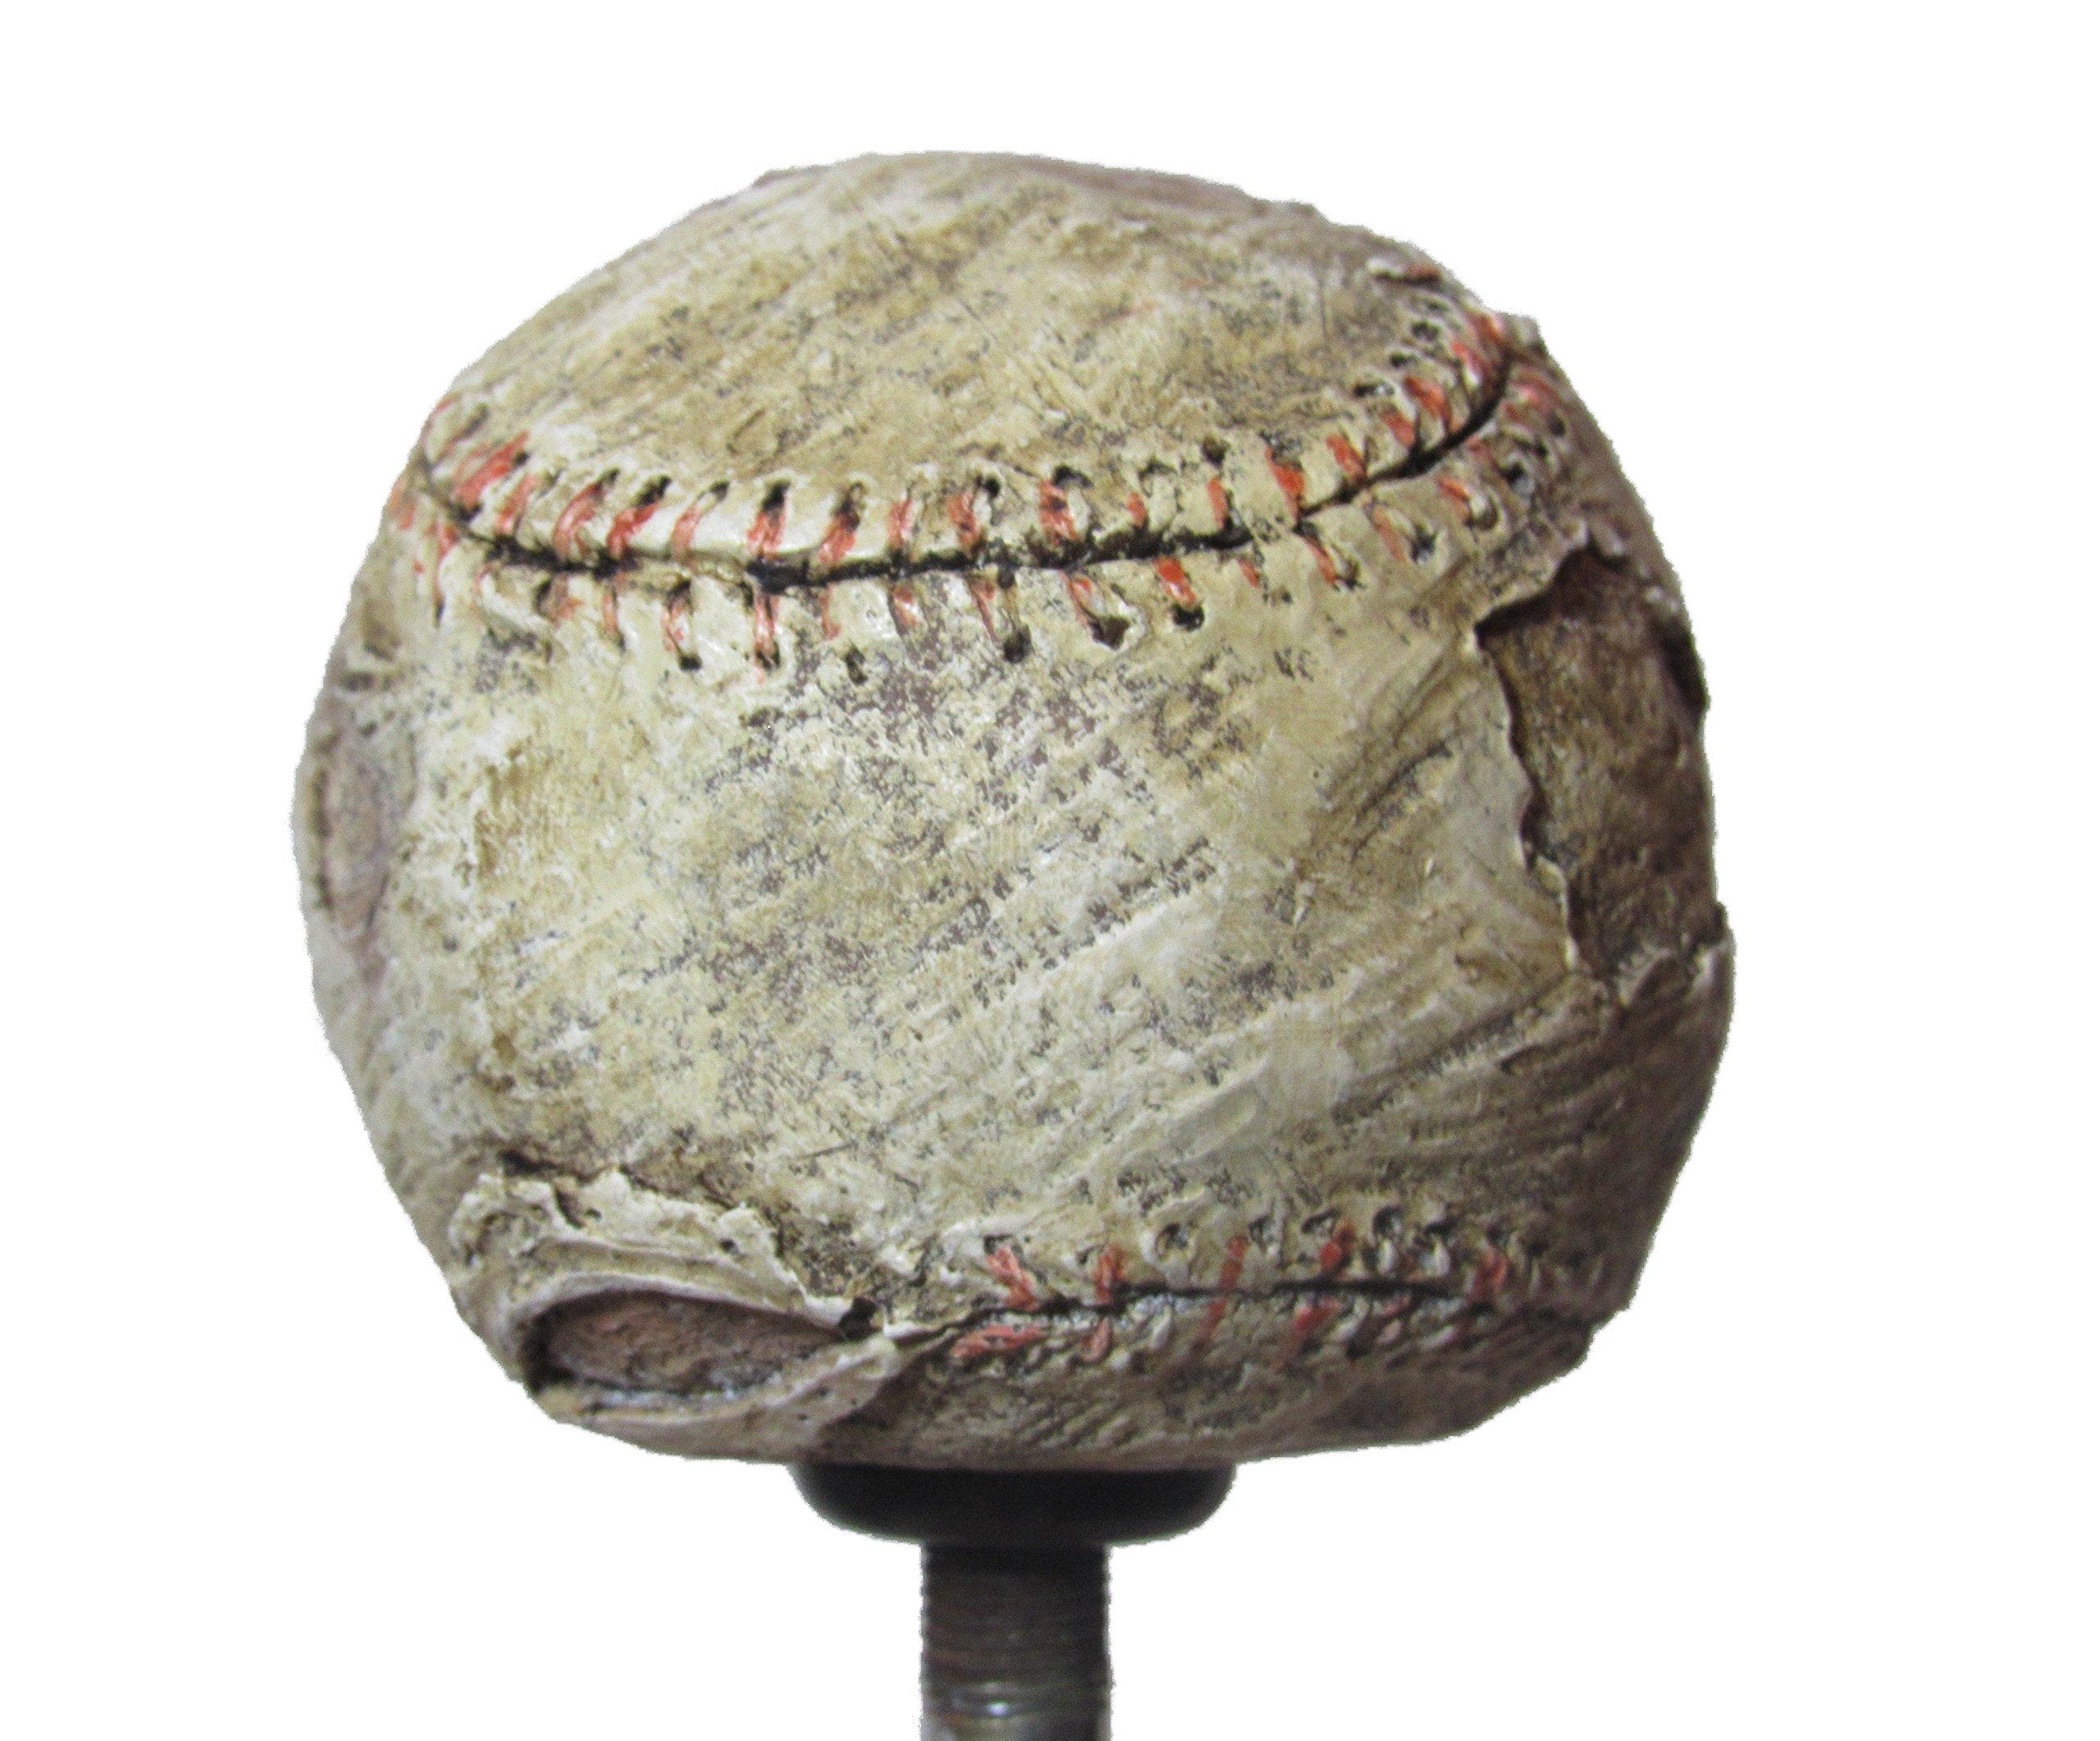 American Shifter 159057 Baseball Transmission Gear Shift Knob with M12 x 1.5 Insert